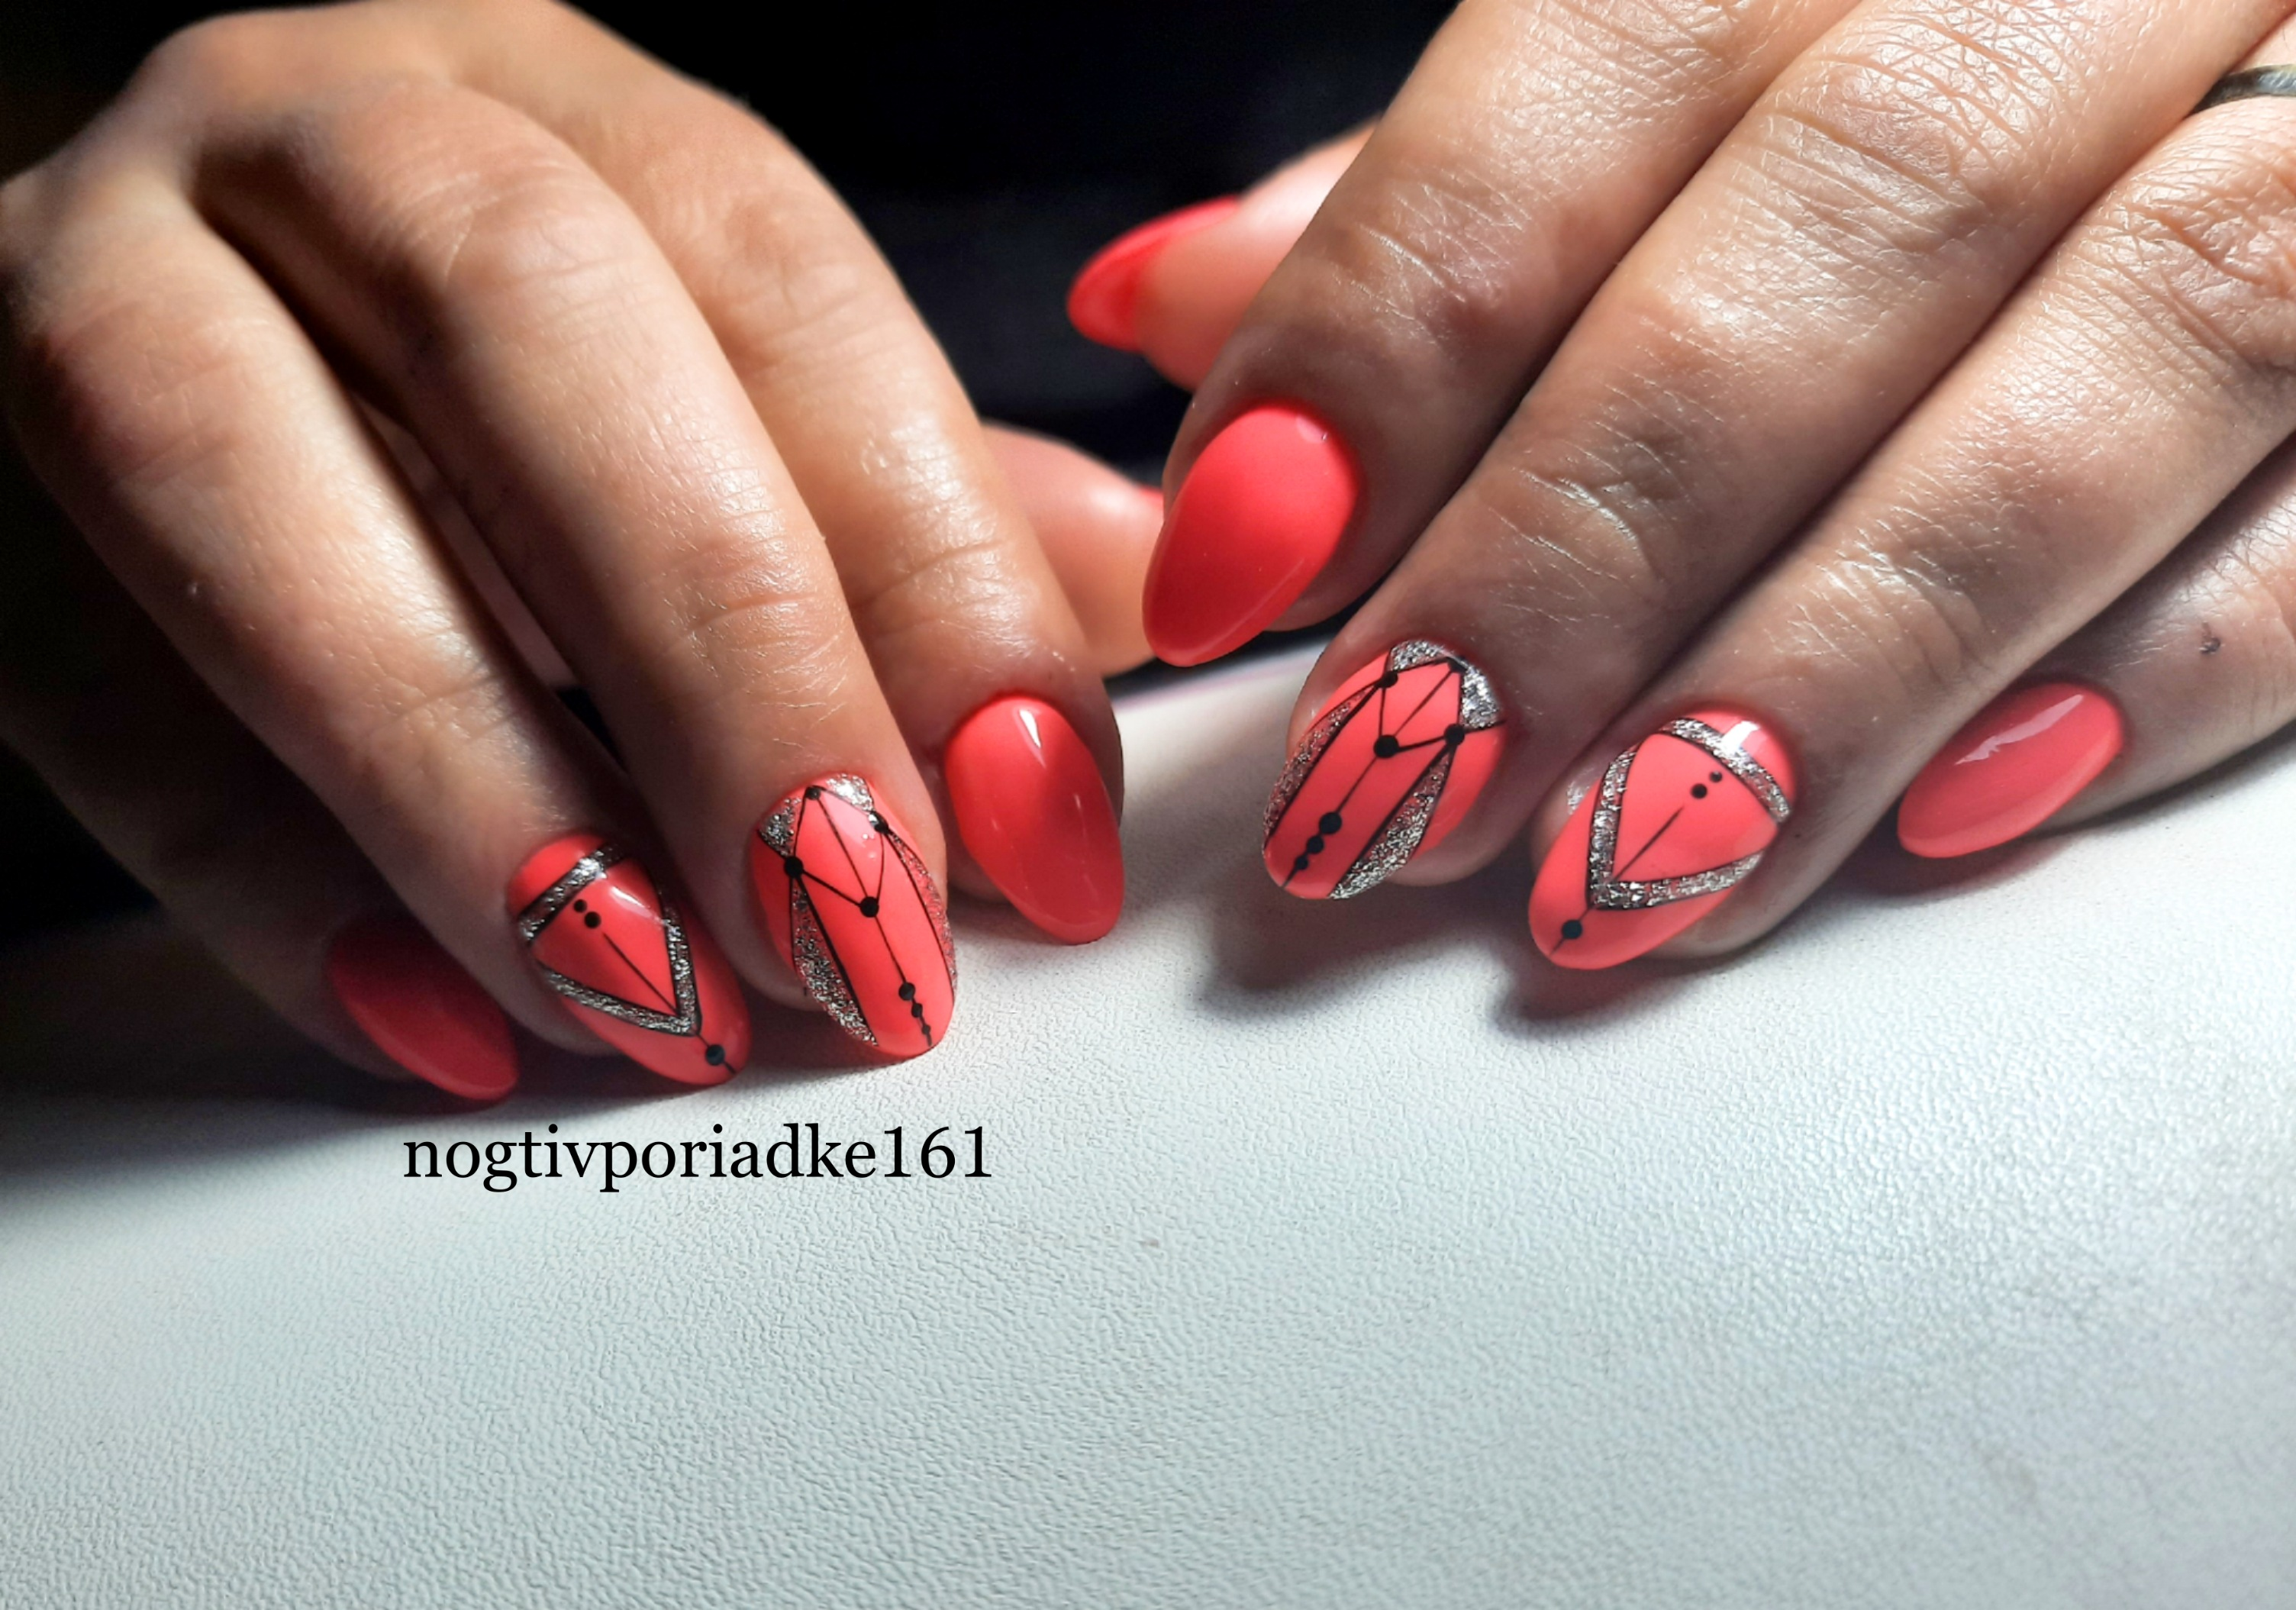 Геометрический маникюр с серебряными блестками в цвете фуксия на короткие ногти.